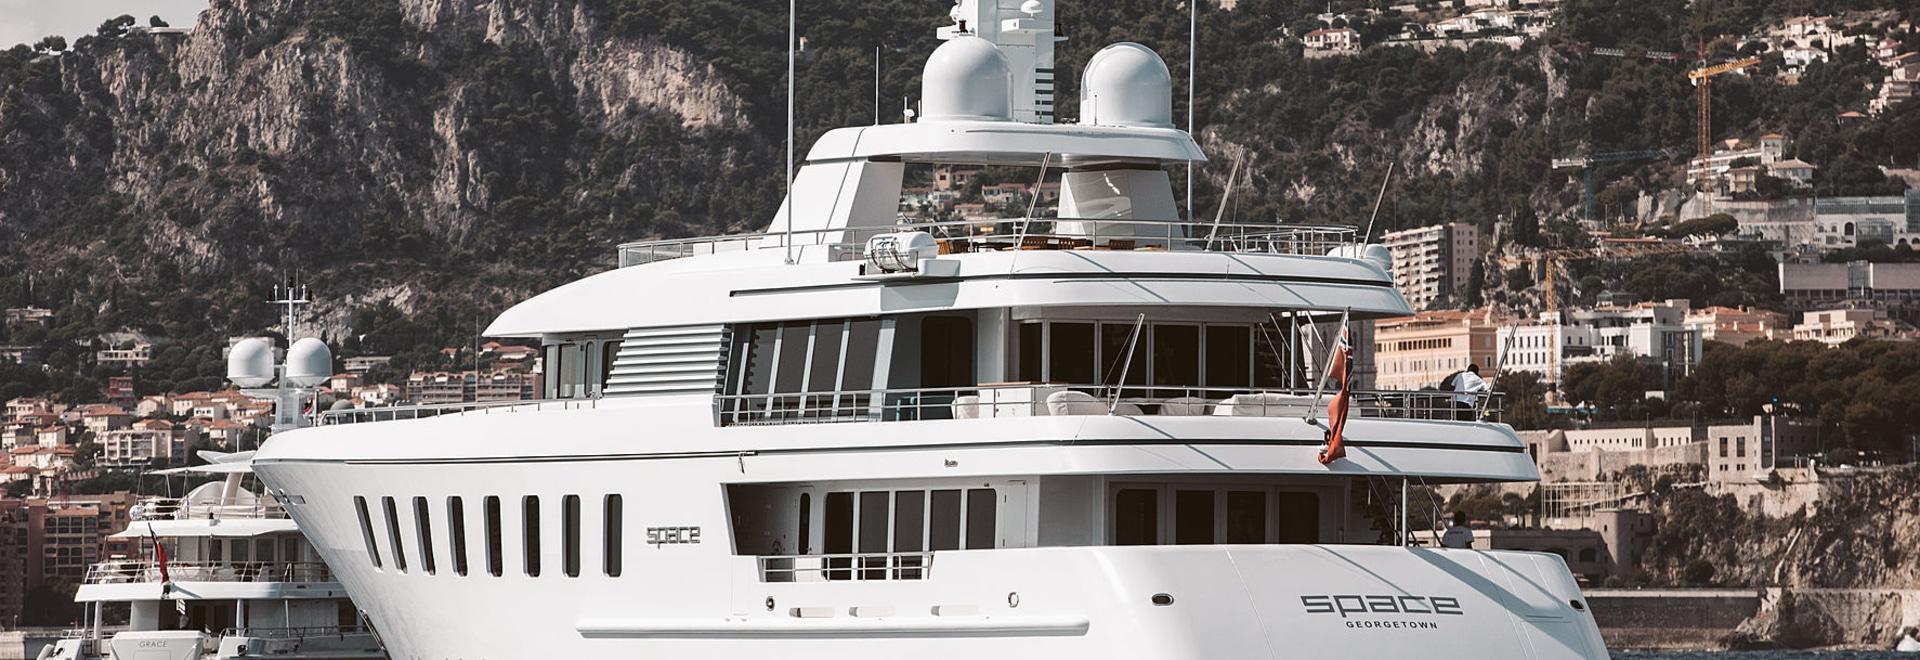 The 45m motor yacht Space underway